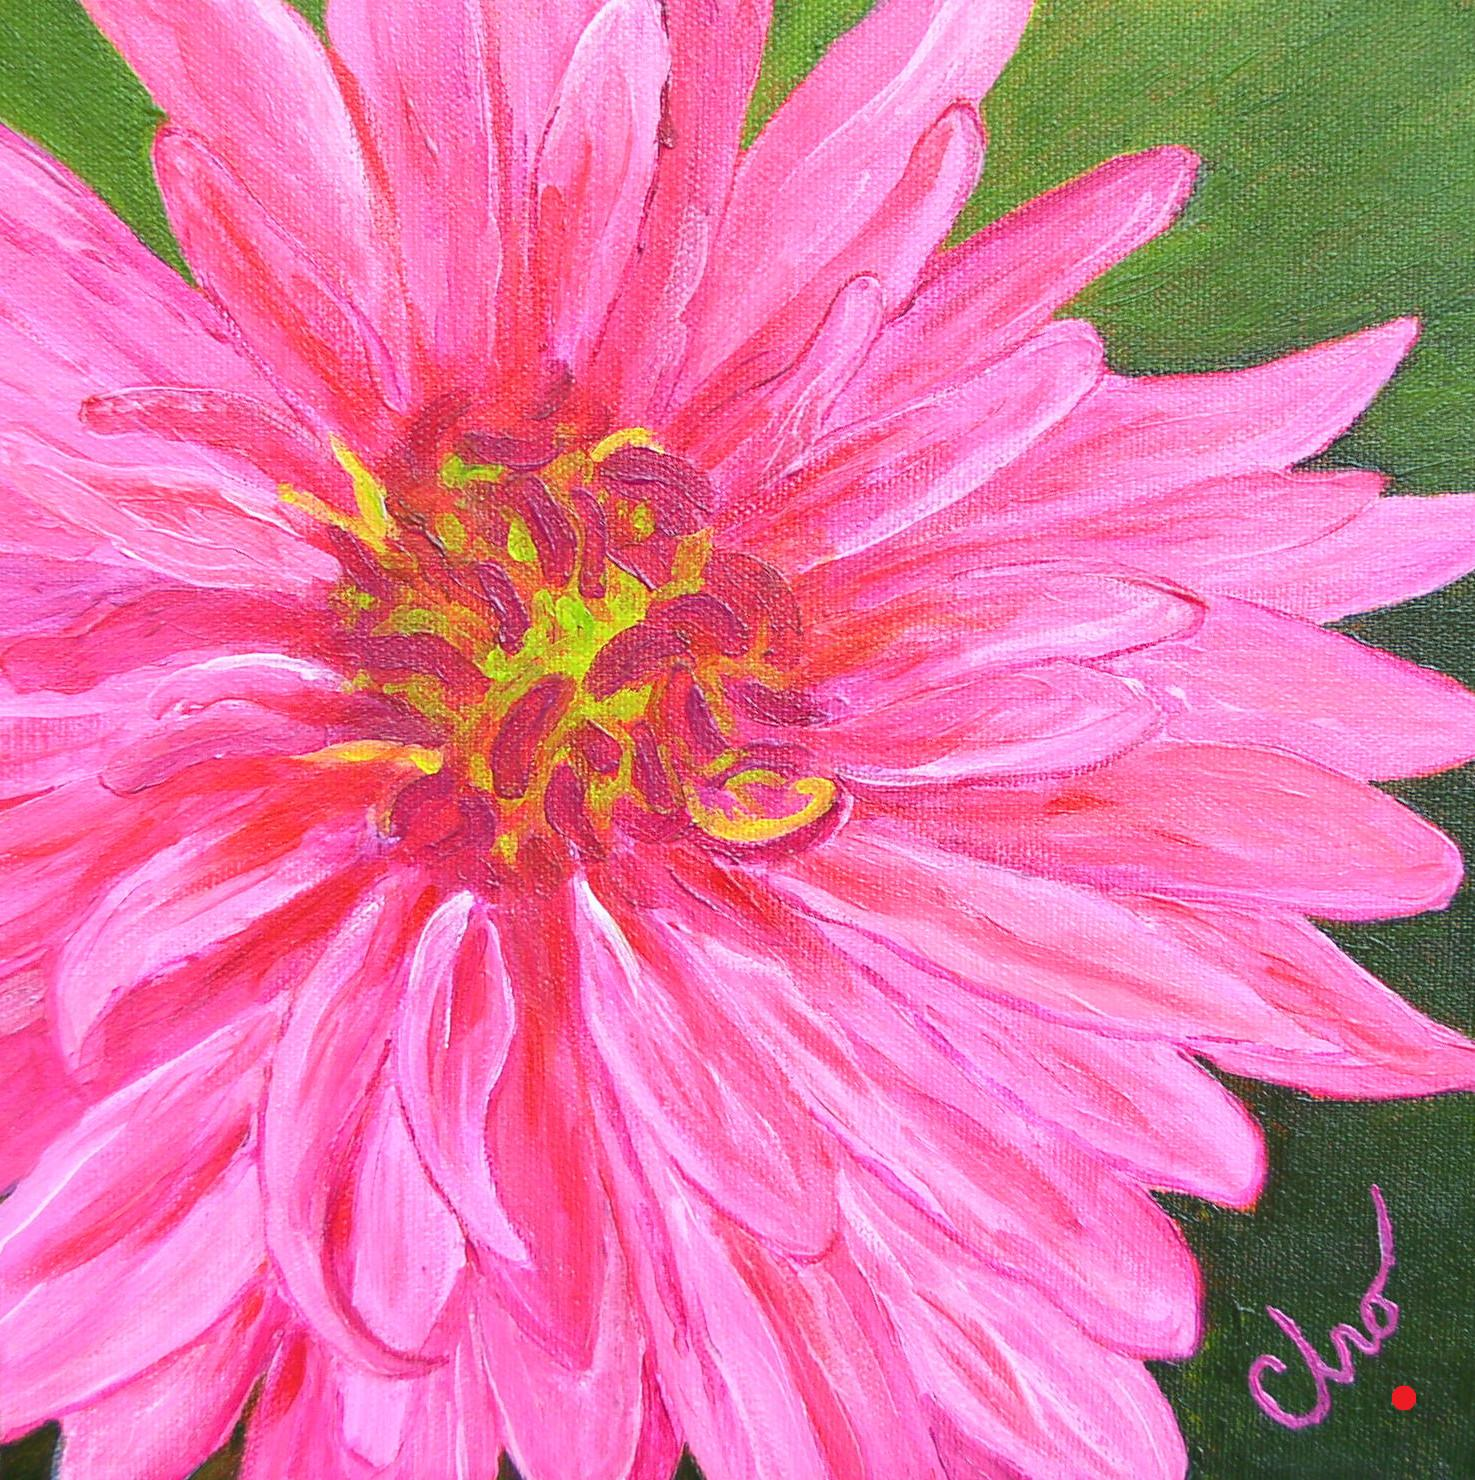 Dahlia 12x12 2009.jpg